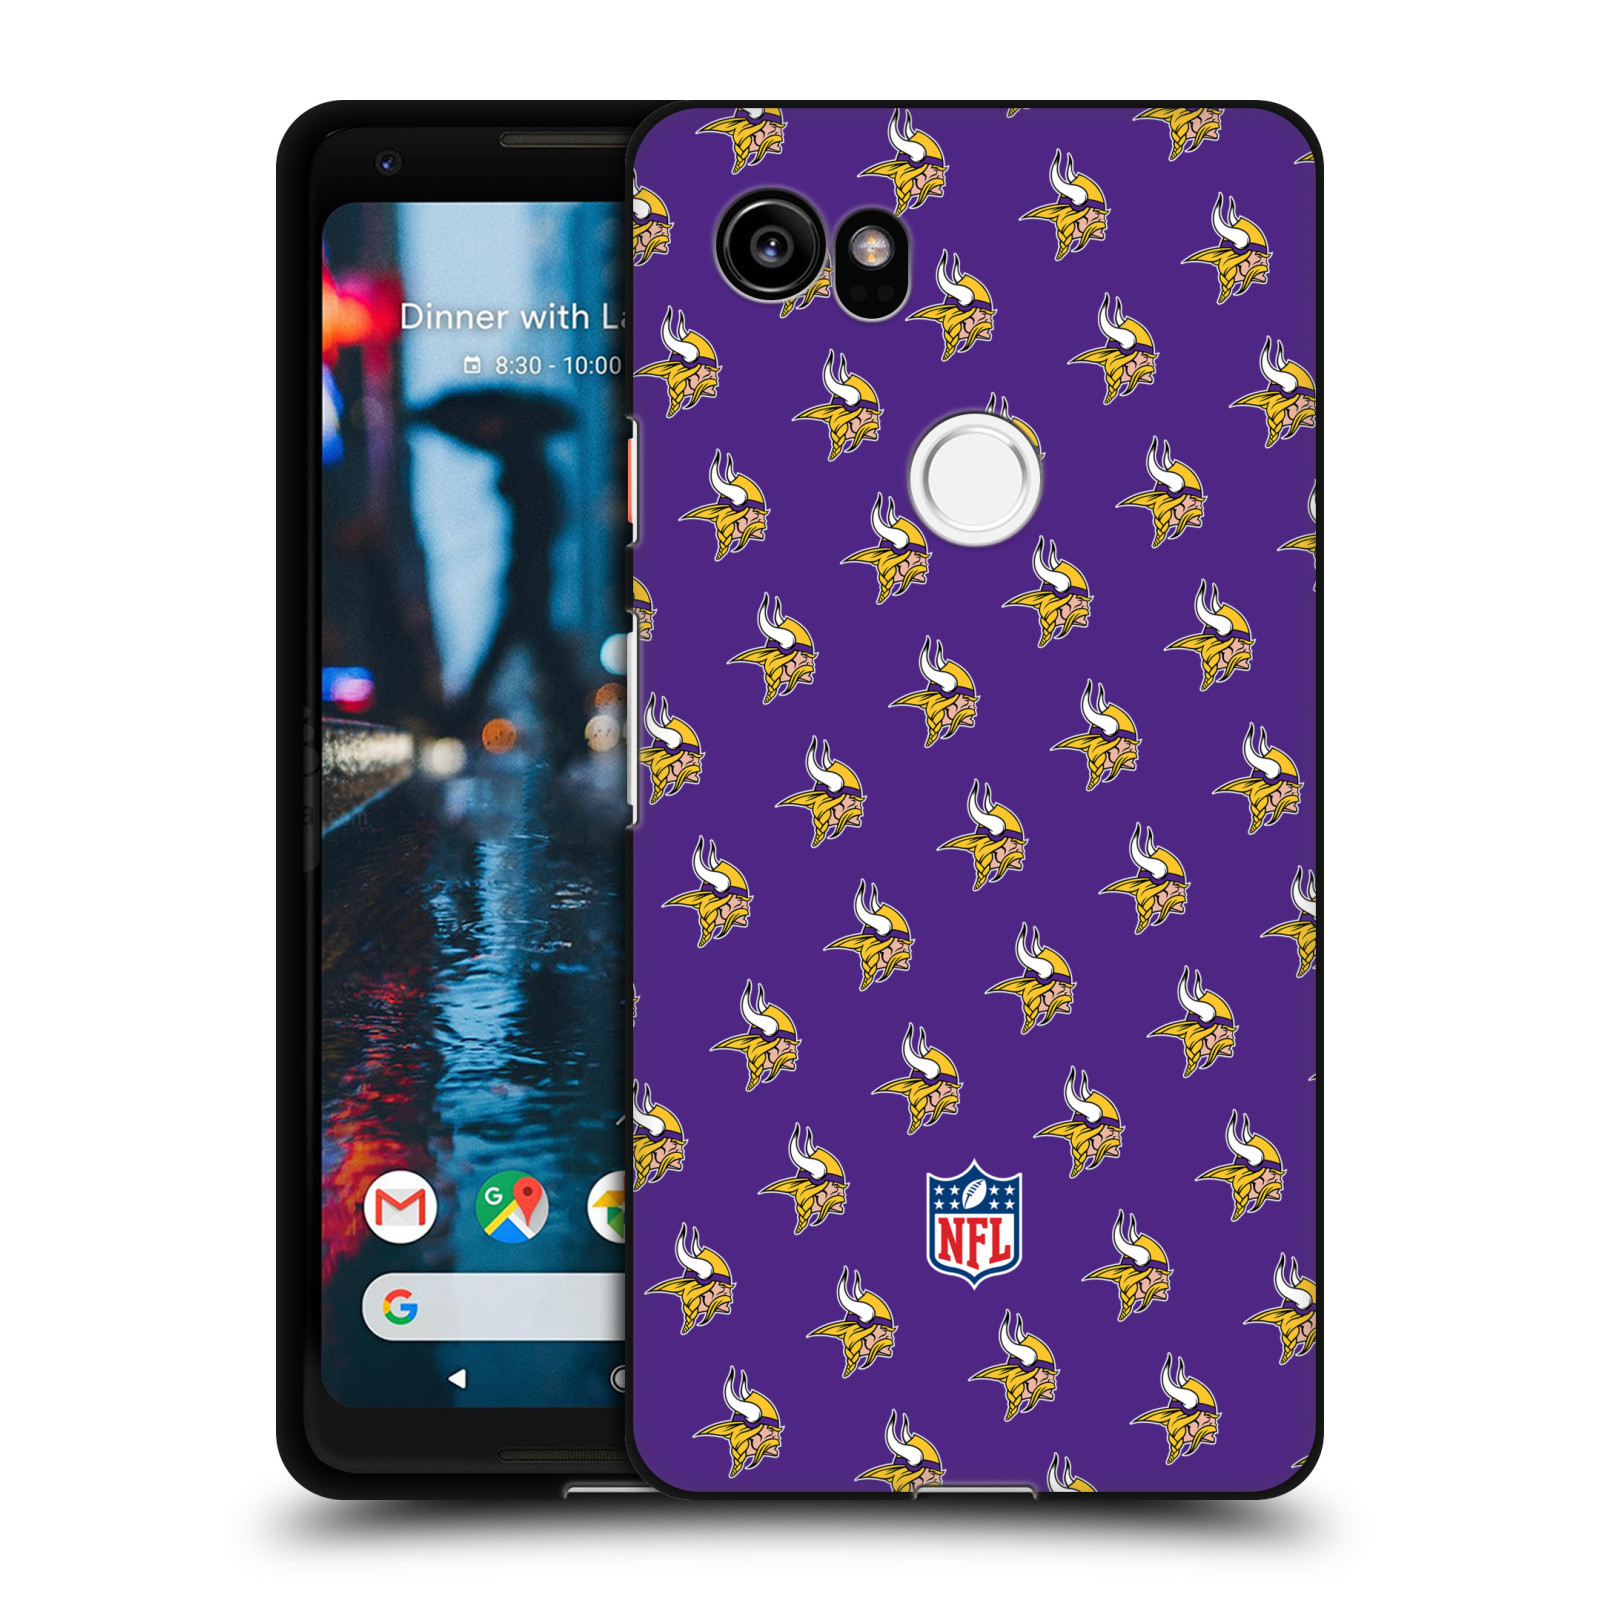 Oficial-de-la-NFL-2017-18-Minnesota-Vikings-Negro-suave-Gel-caso-para-telefonos-de-Google